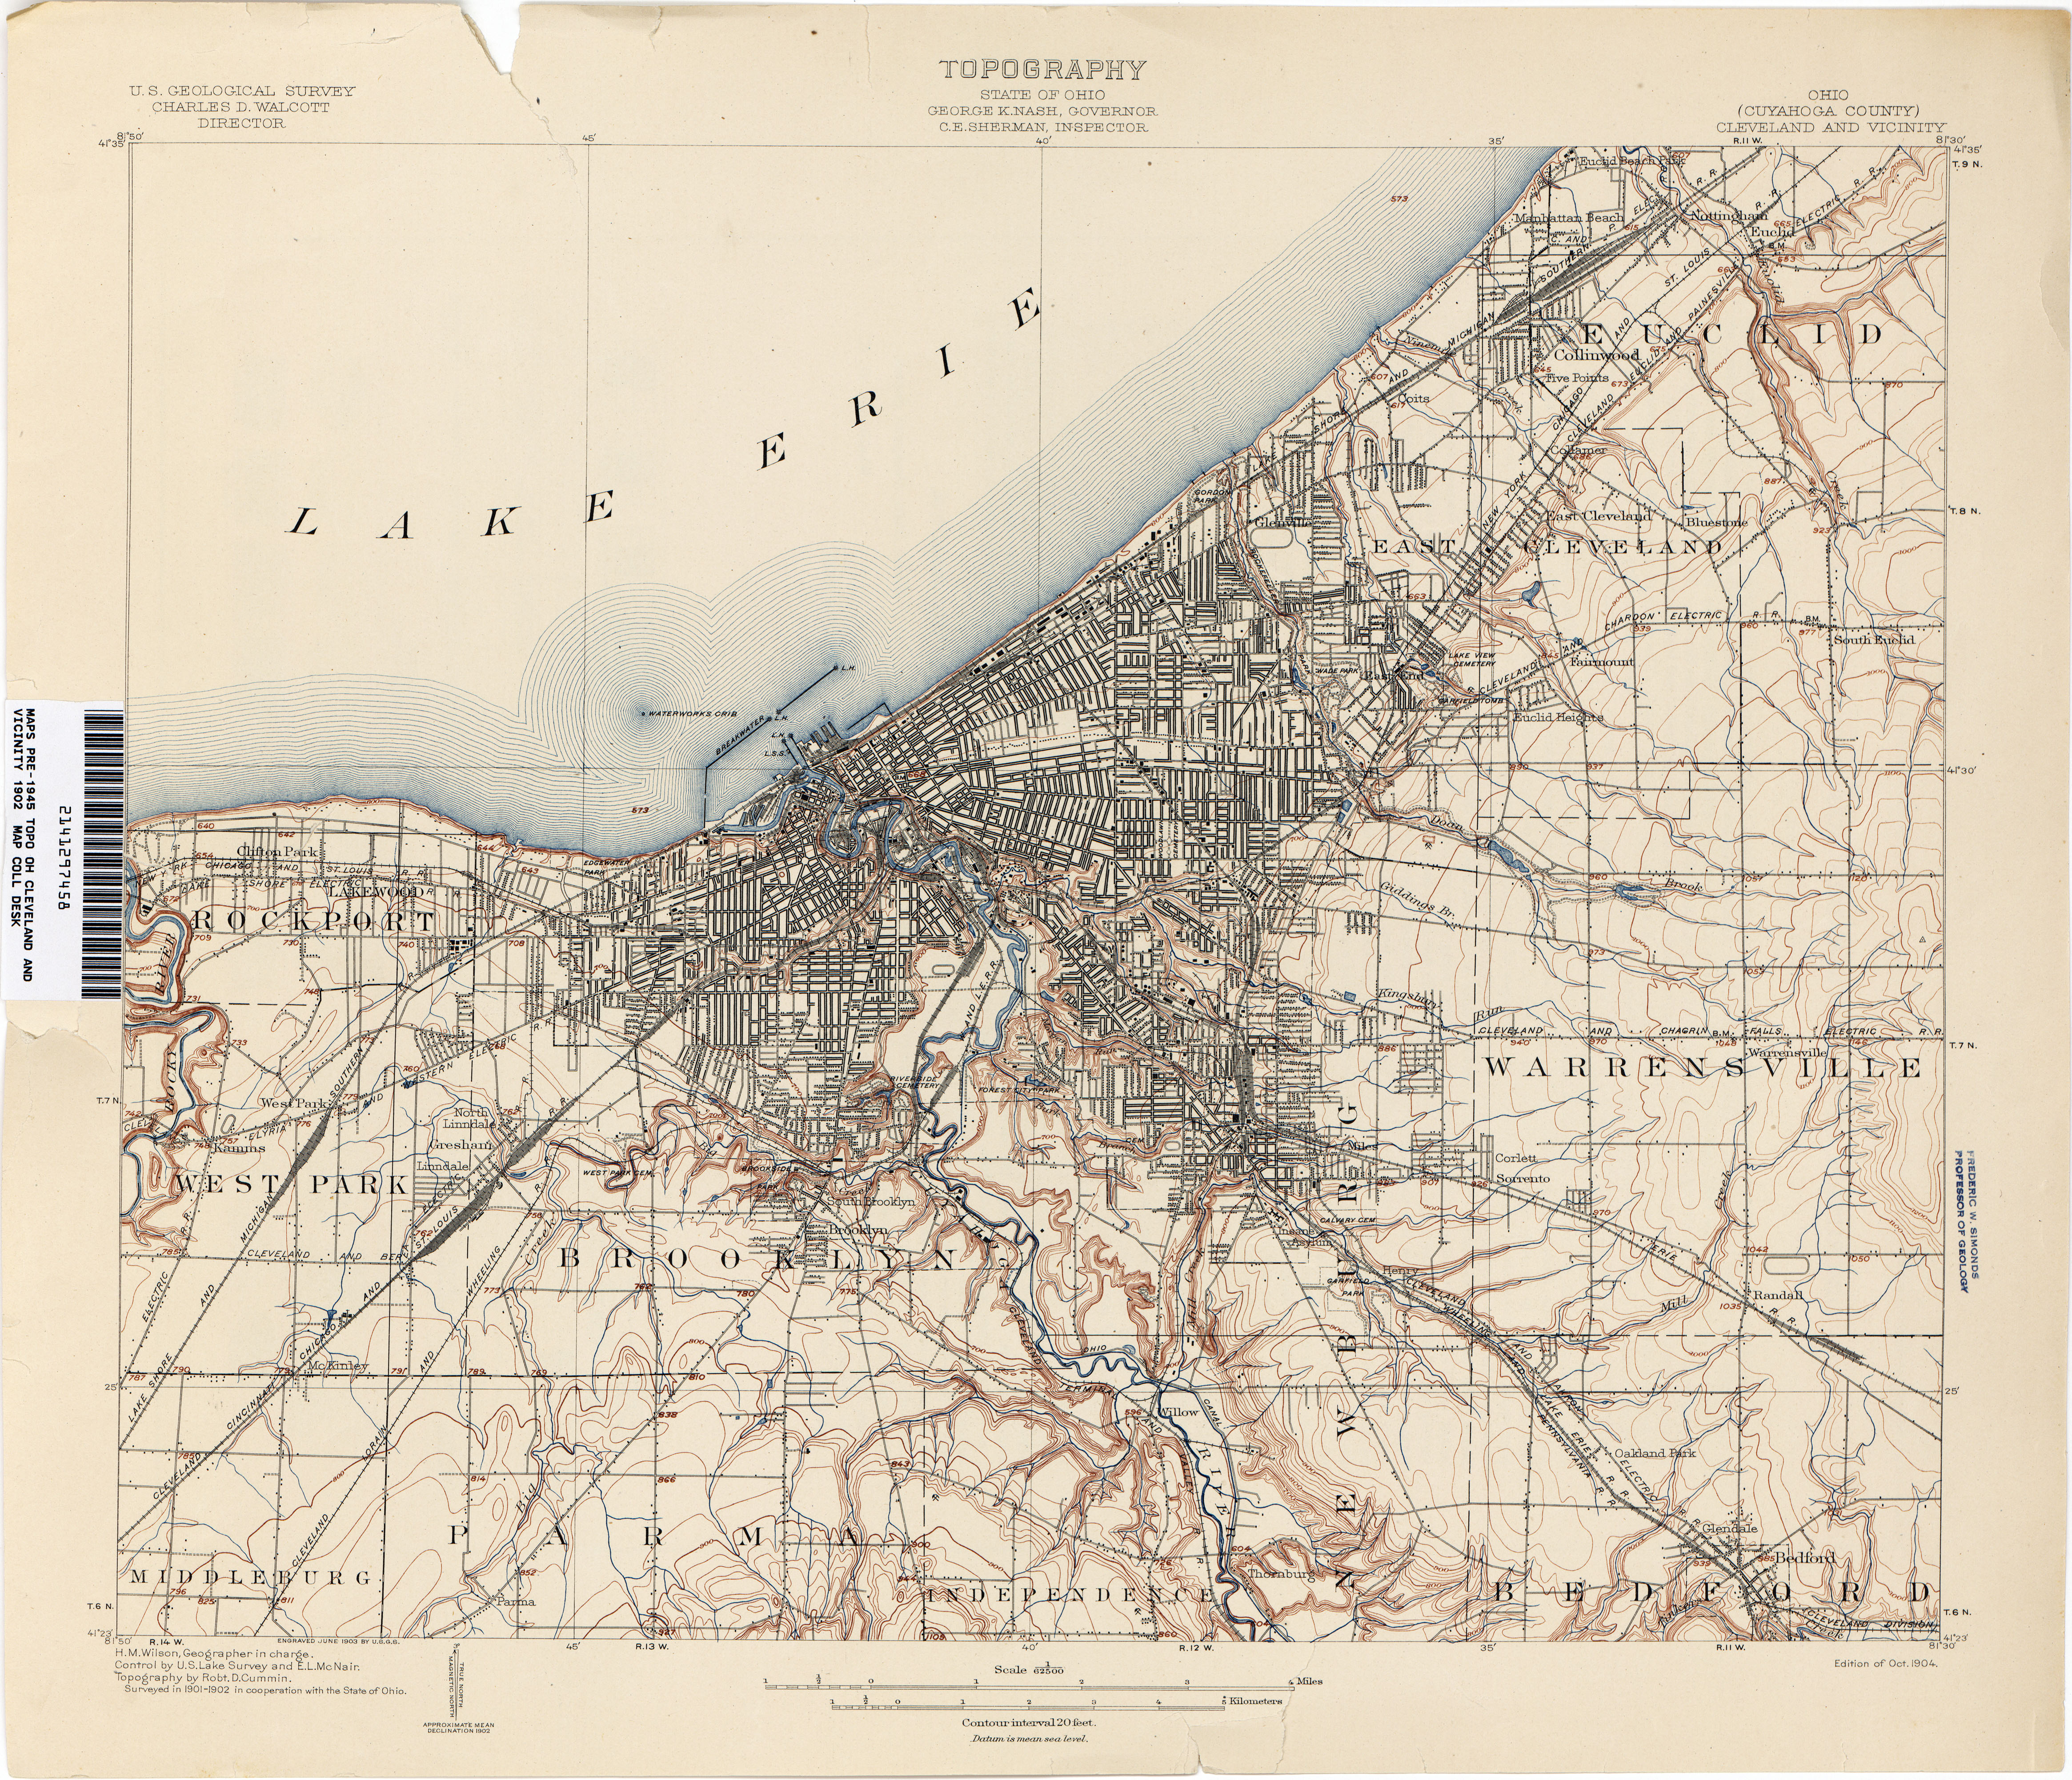 Ohio Historical Topographic Maps PerryCastañeda Map Collection - Historical topo maps